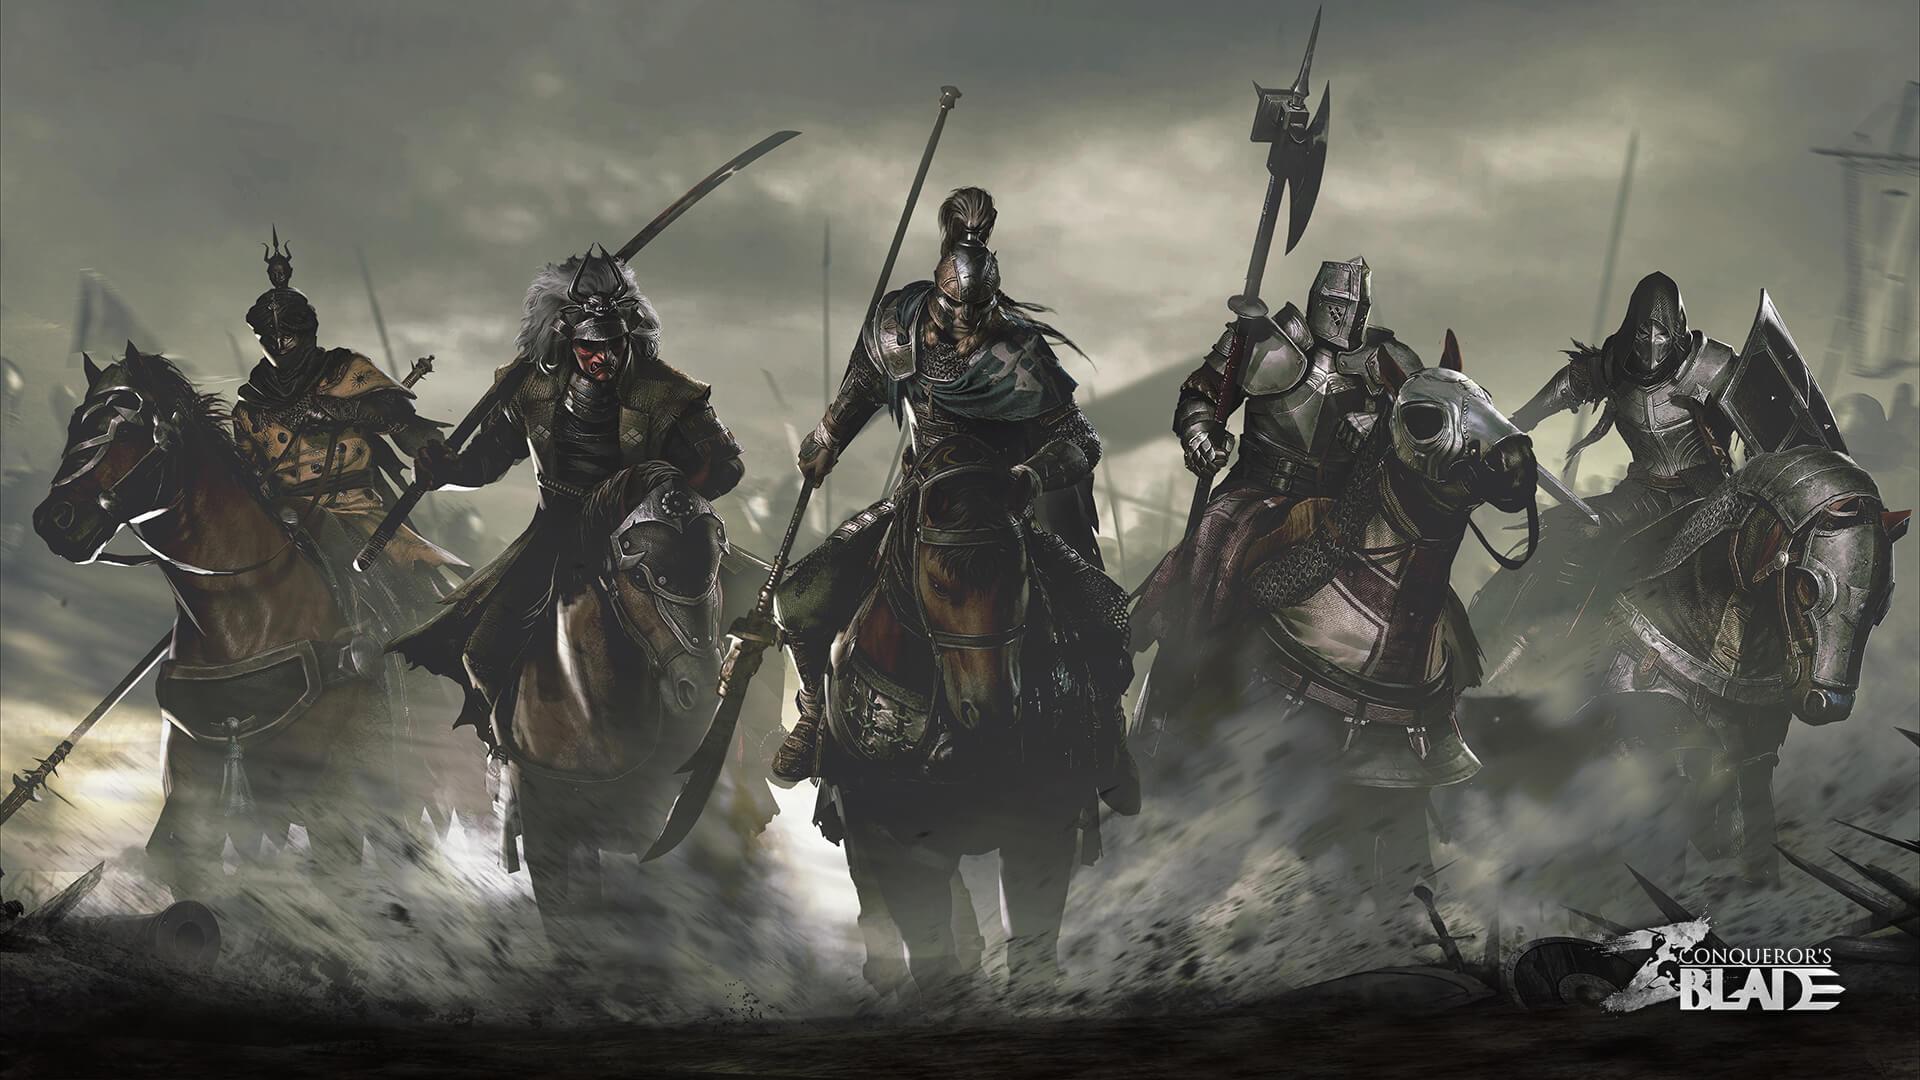 Conquerors-blade-art-01